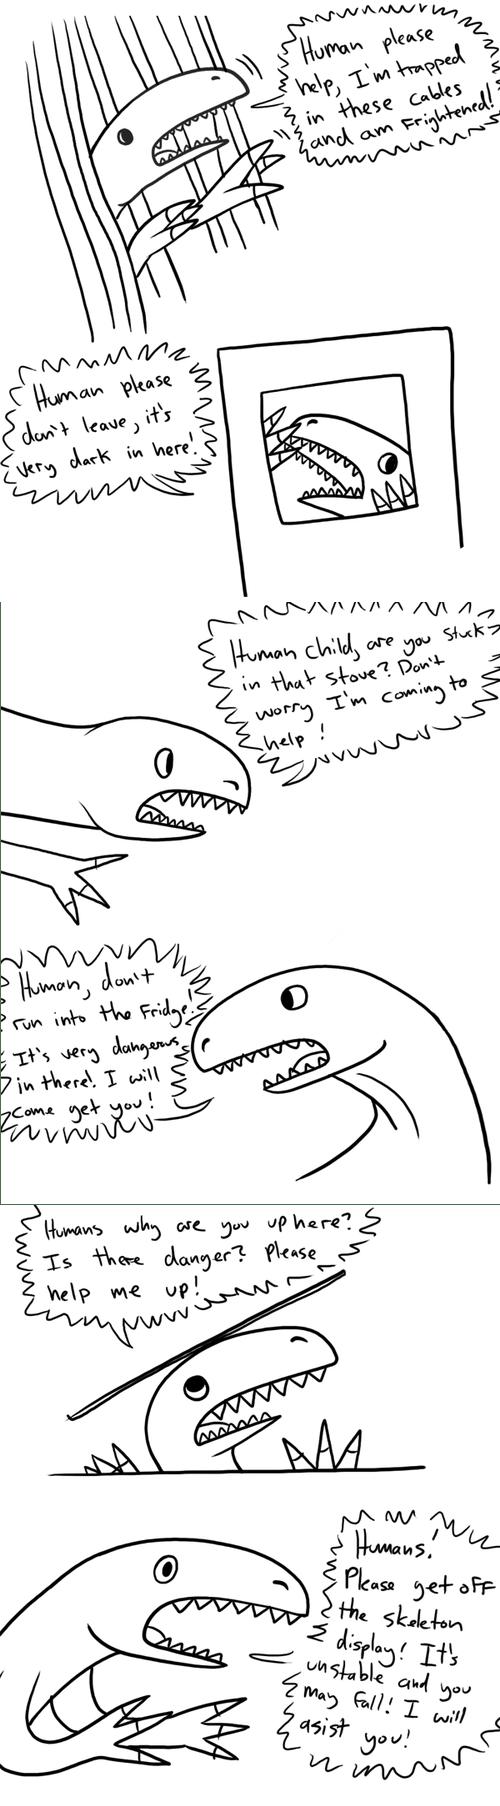 velociraptors jurassic park dinosaurs web comics